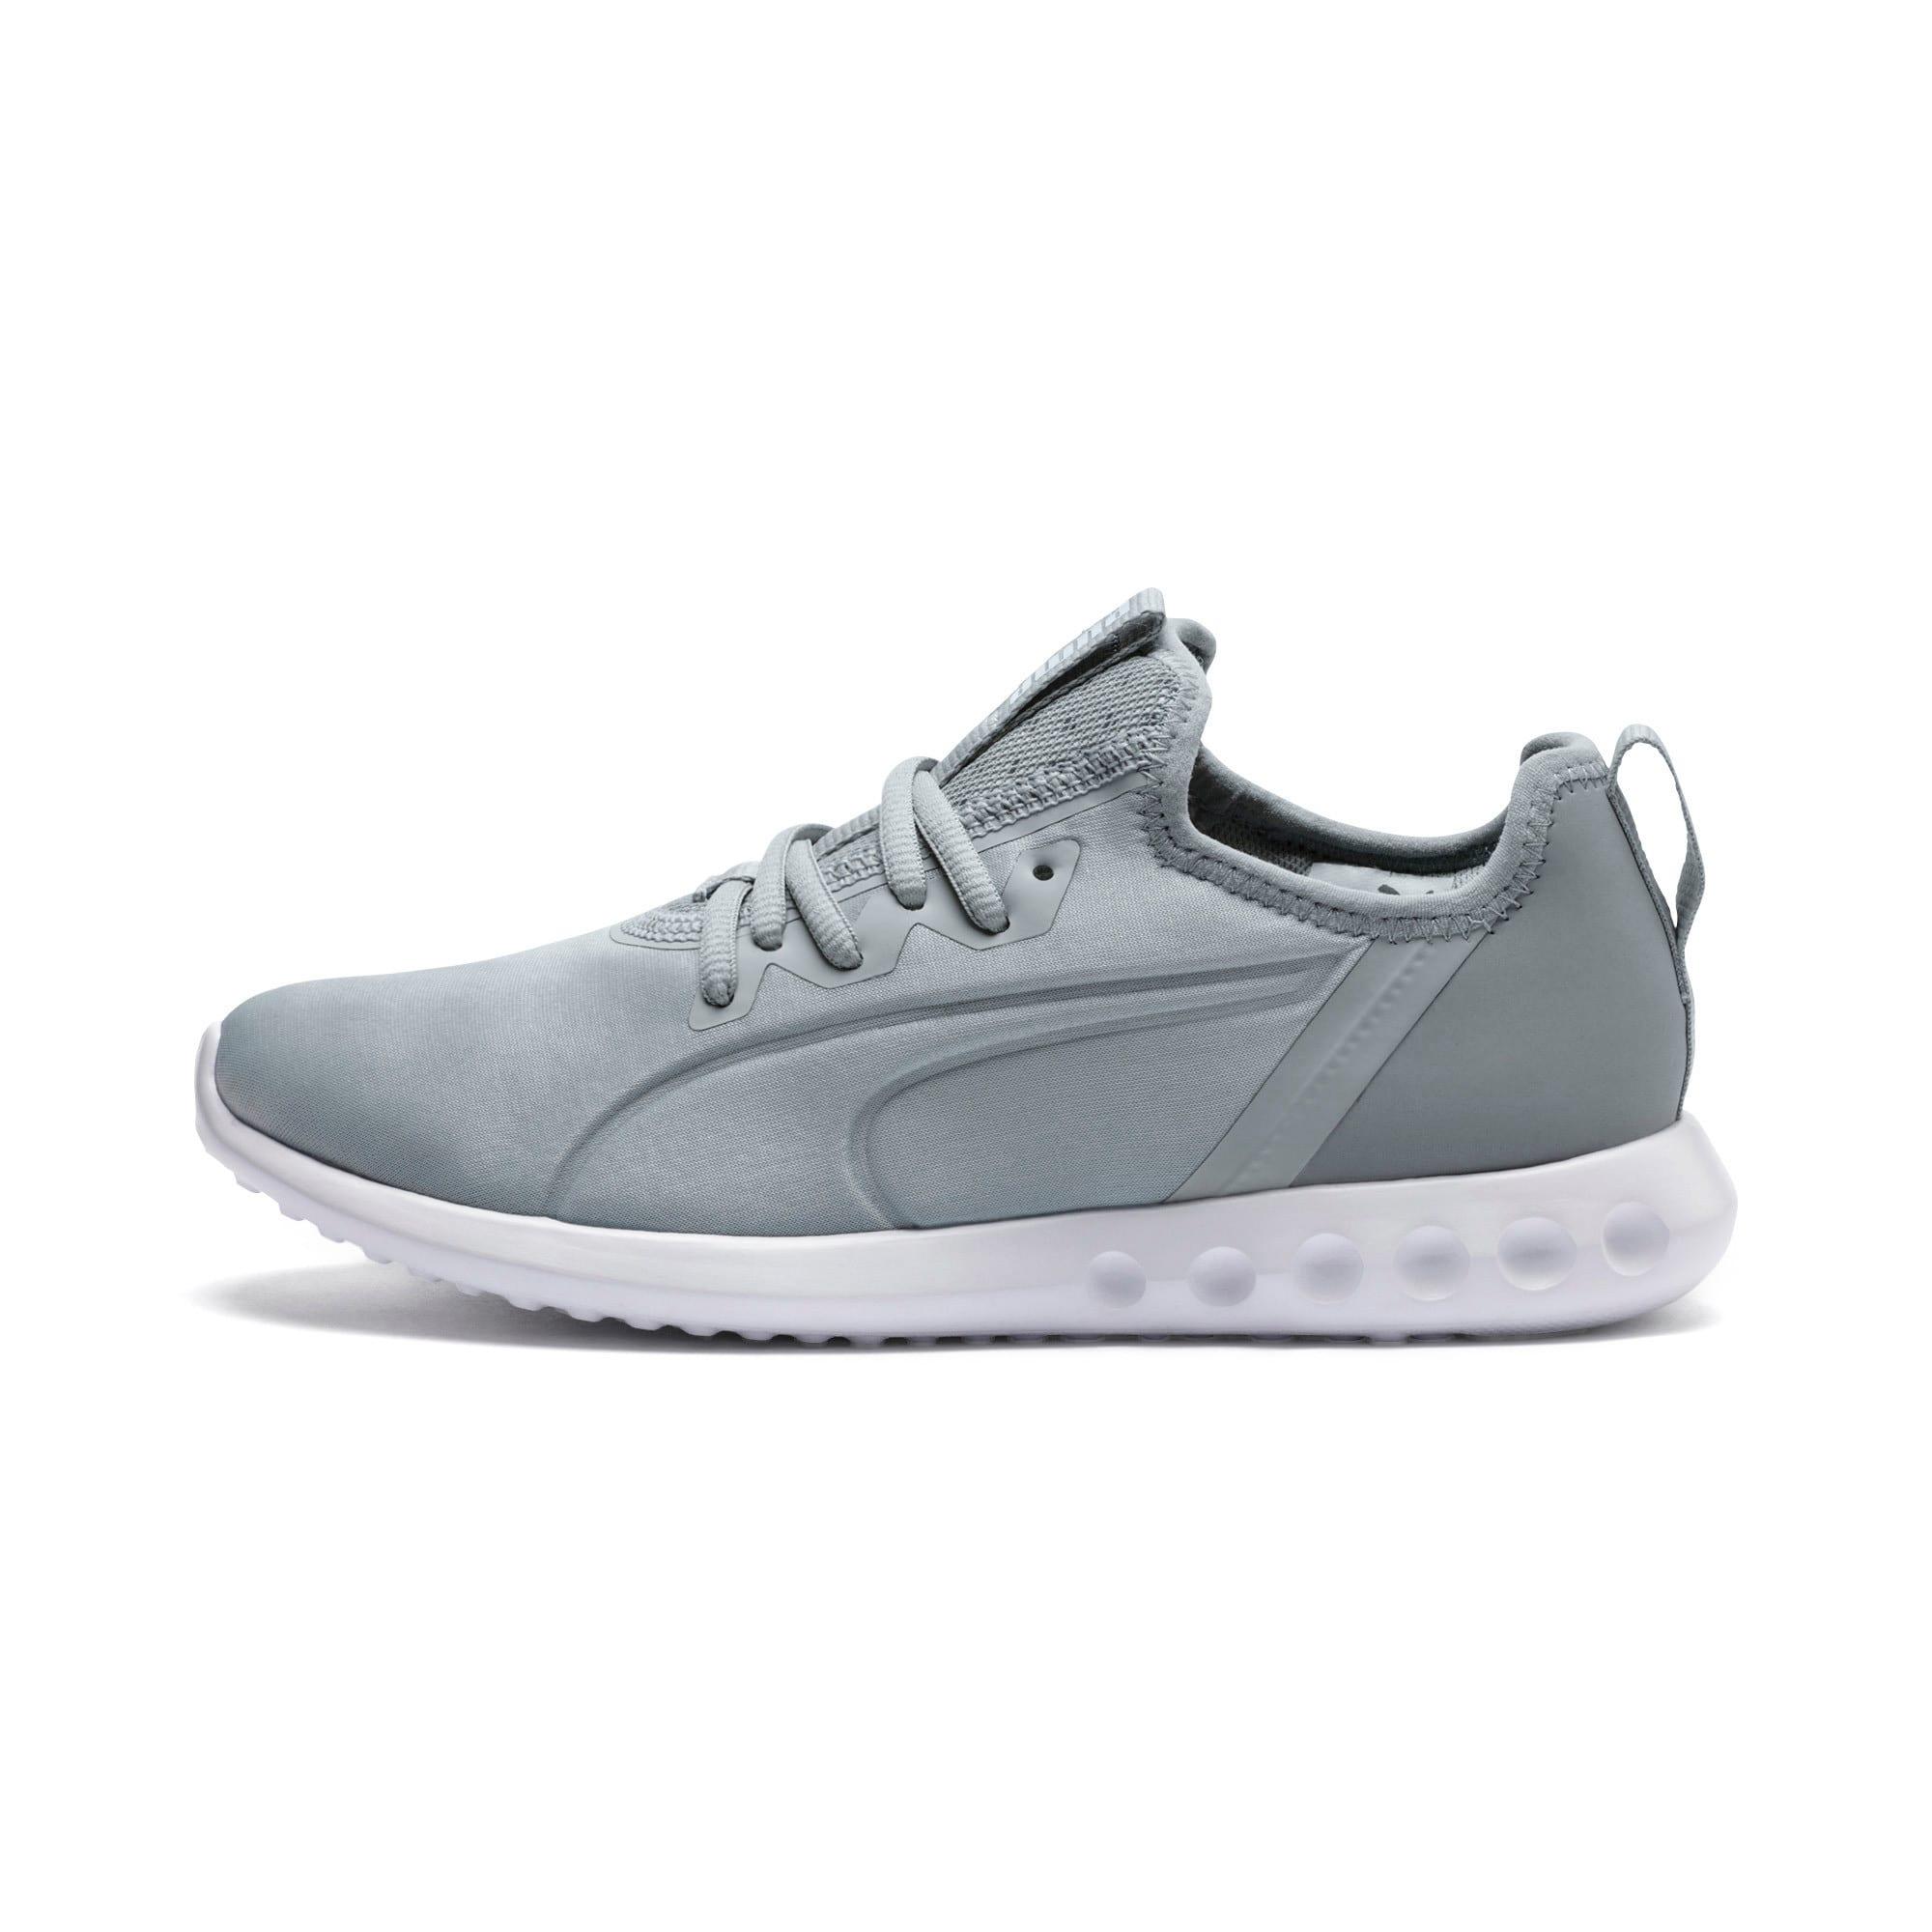 Thumbnail 1 of Carson 2 X Women's Running Shoes, Quarry-CERULEAN, medium